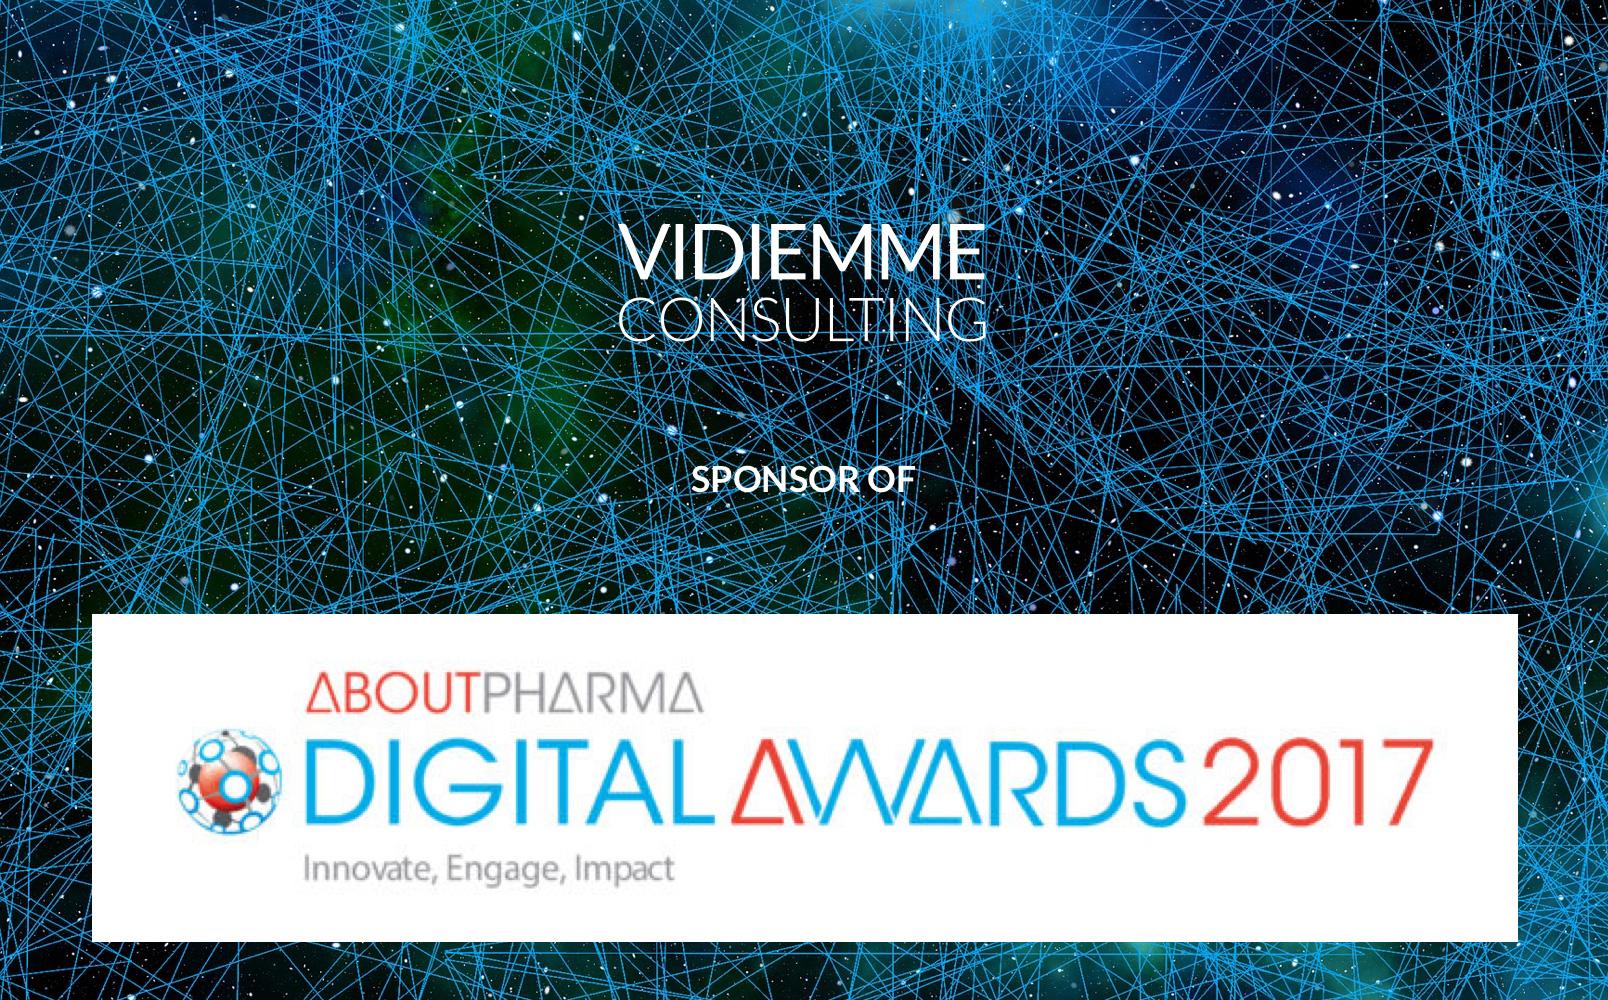 Vidiemme sponsor degli AboutPharma Digital Awards 2017